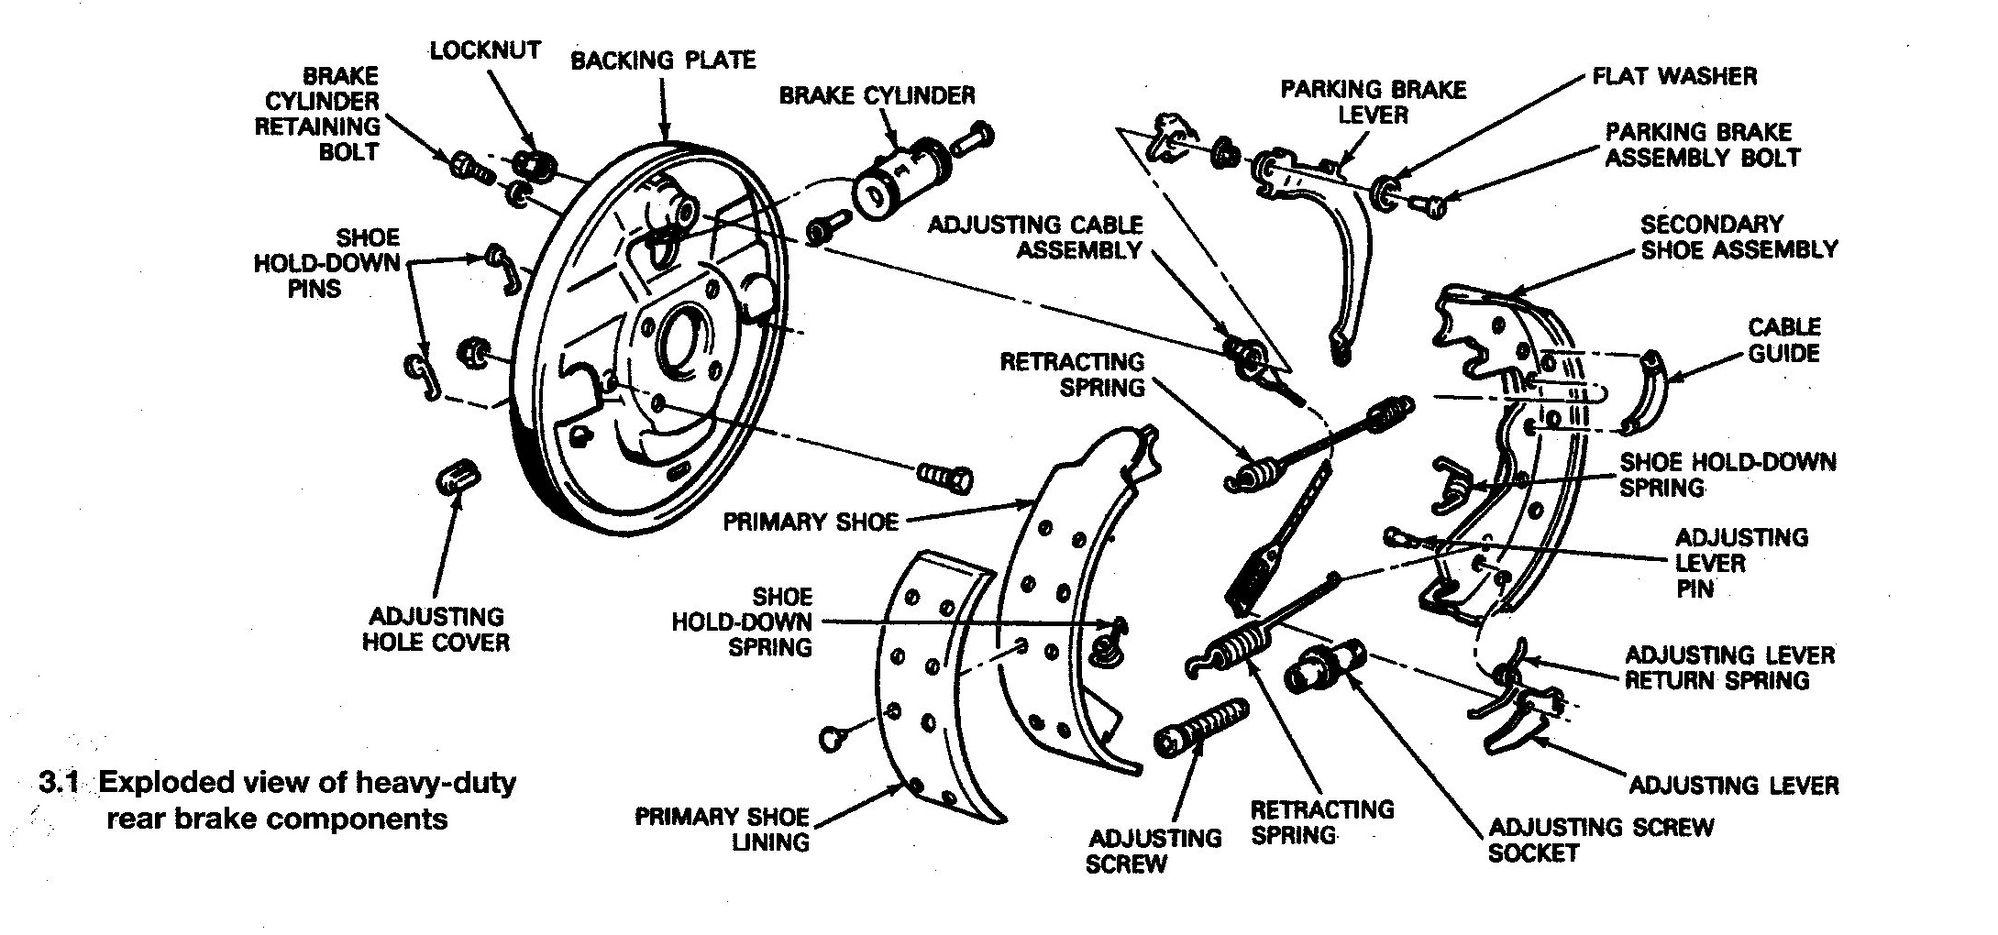 2006 nissan murano engine diagram